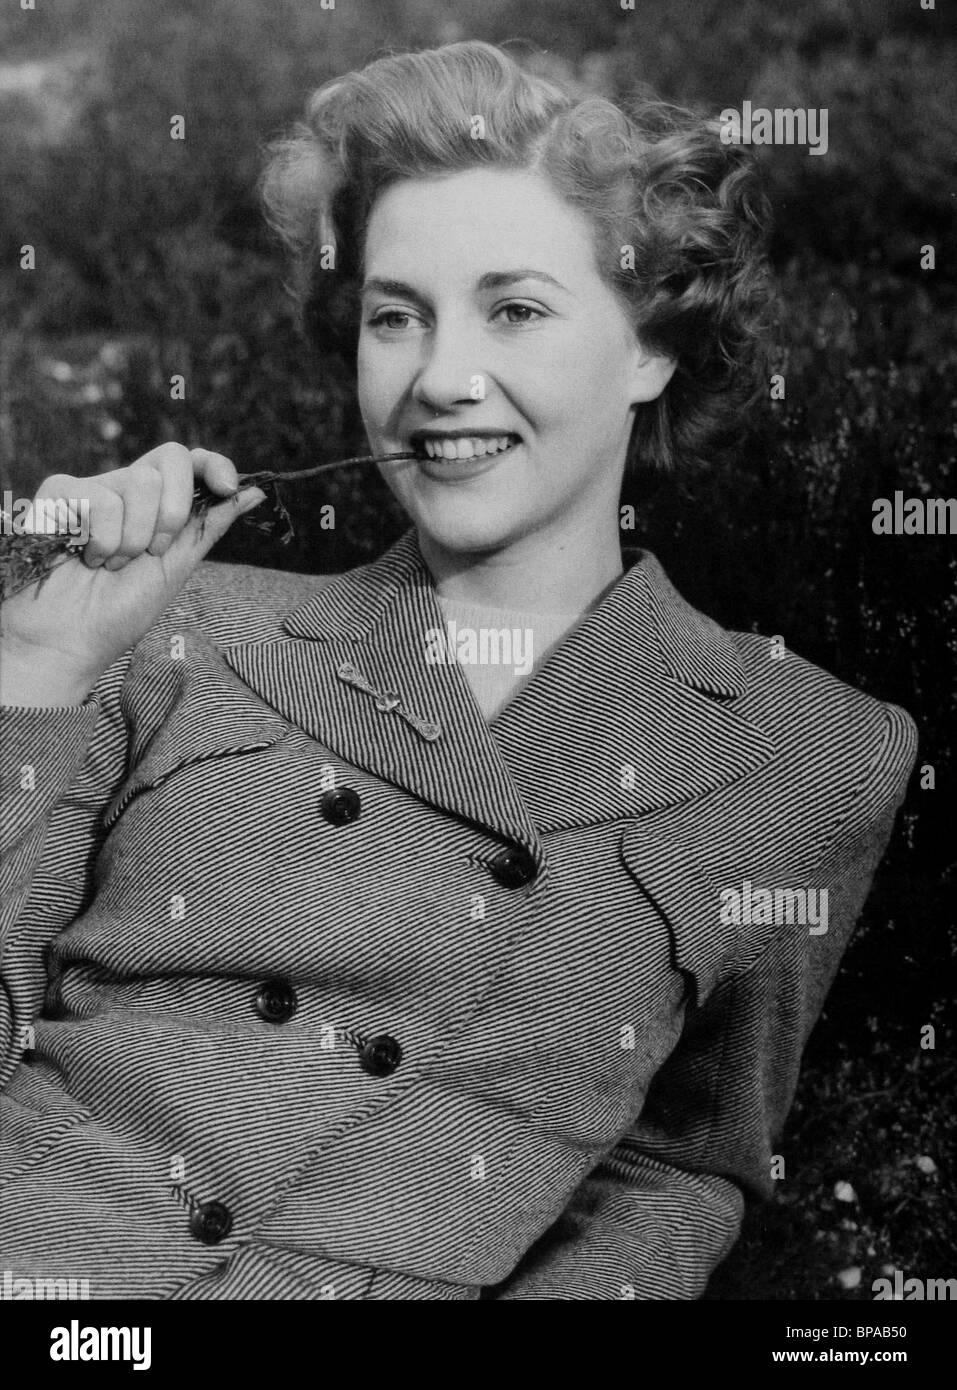 Debbie Reynolds,Monica Gill Adult photos Taryn Power,Maricel Soriano (b. 1965)